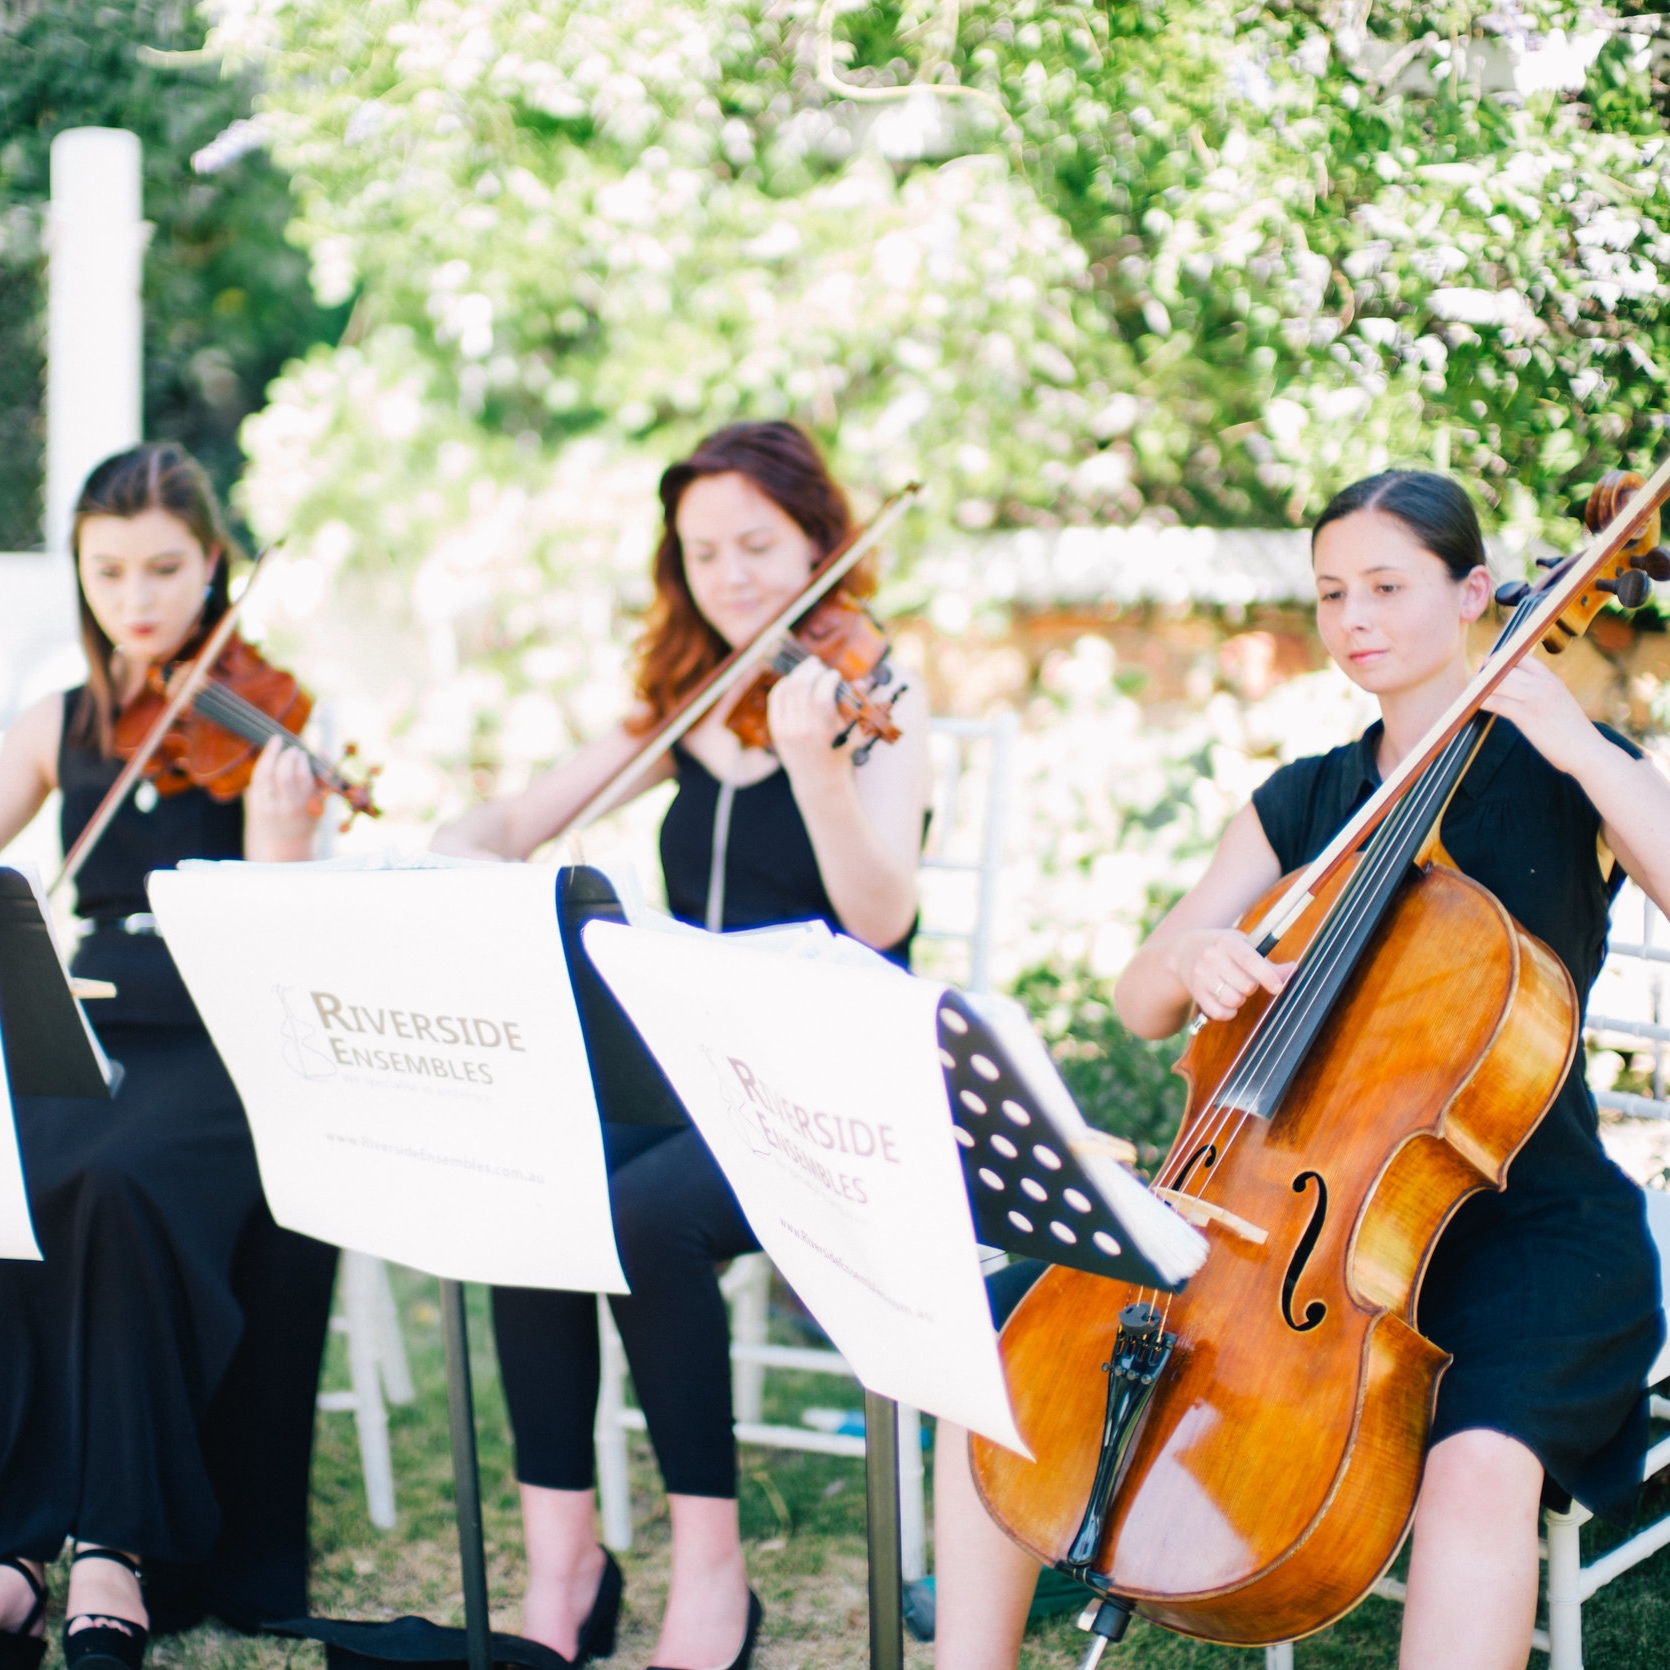 perth-function-string-music-hire-wedding-riverside-musiciansperth-function-string-music-hire-wedding-riverside-musicians-classical-contemporary-trio-violinist-cellist